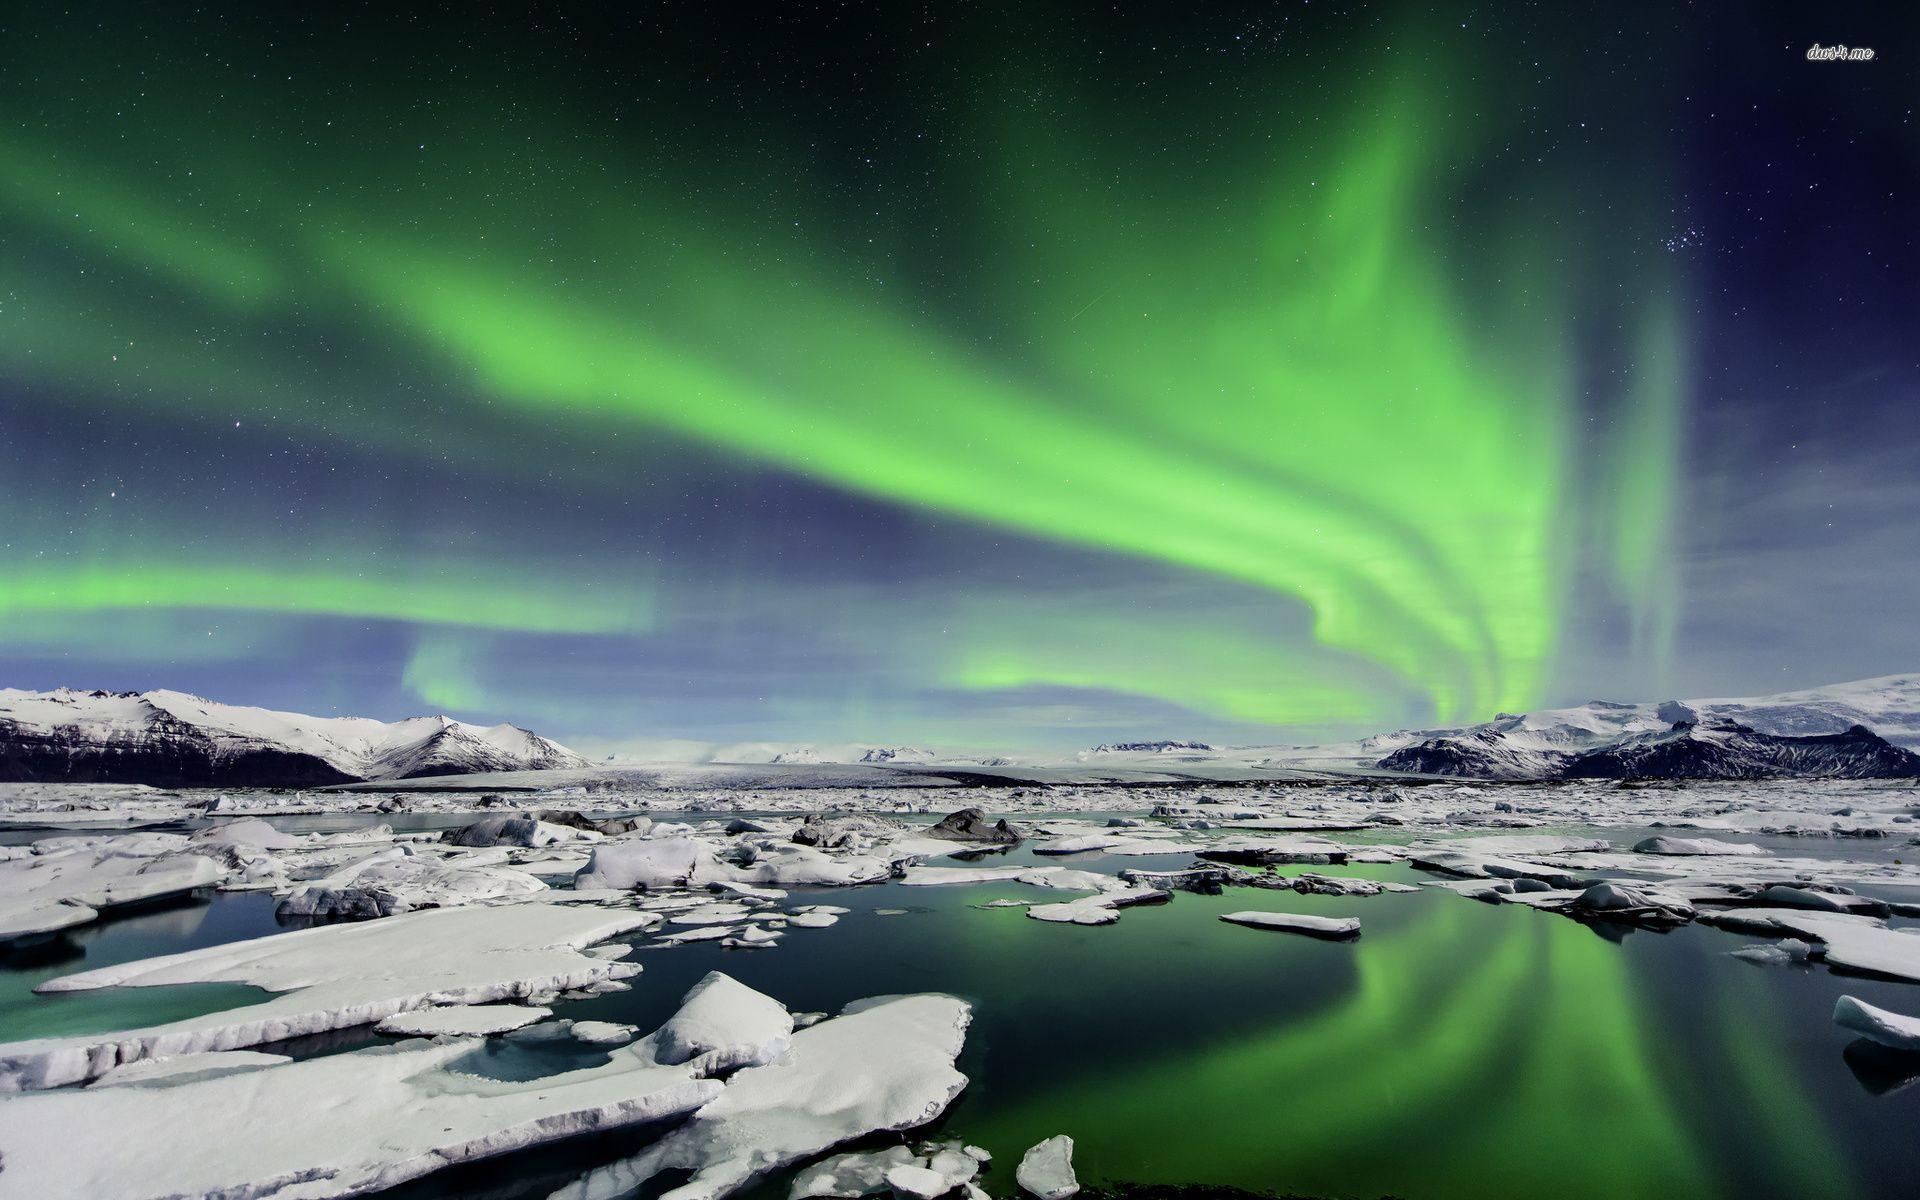 HD Northern Lights Wallpapers Download Free Noorderlicht